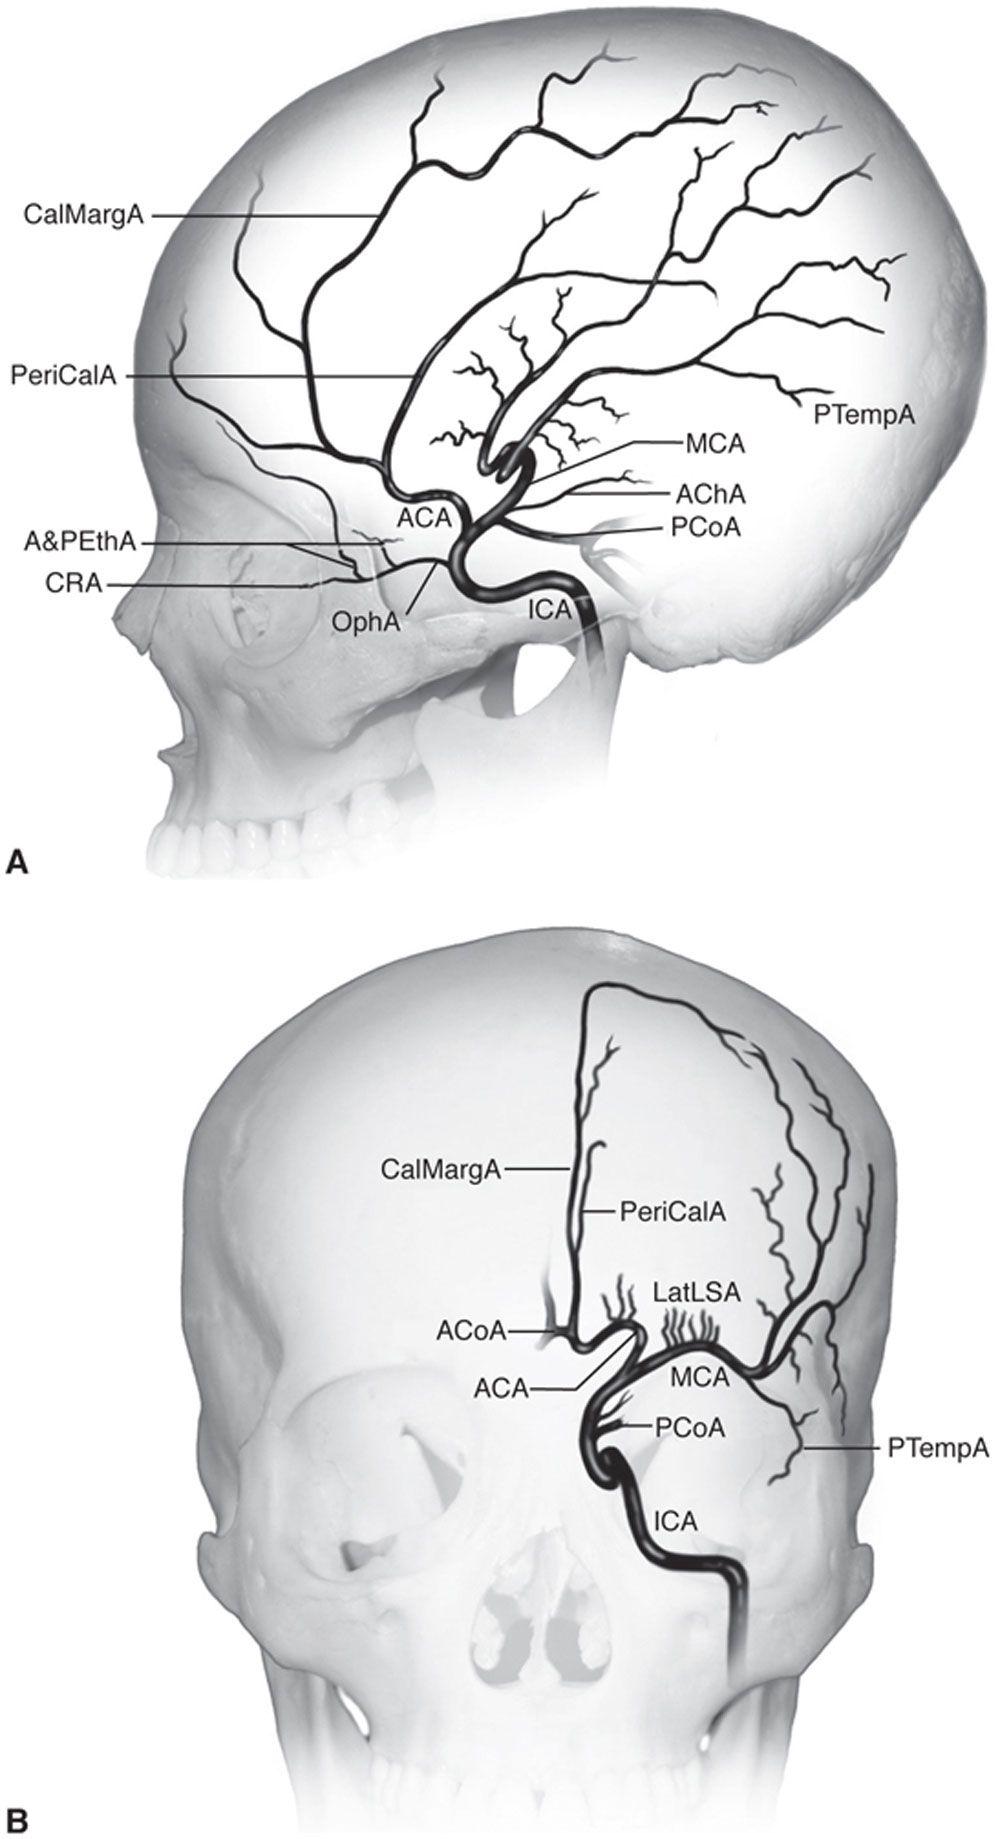 Pin de ROBERT SKONE en Anatomía fisiología Humana | Pinterest ...